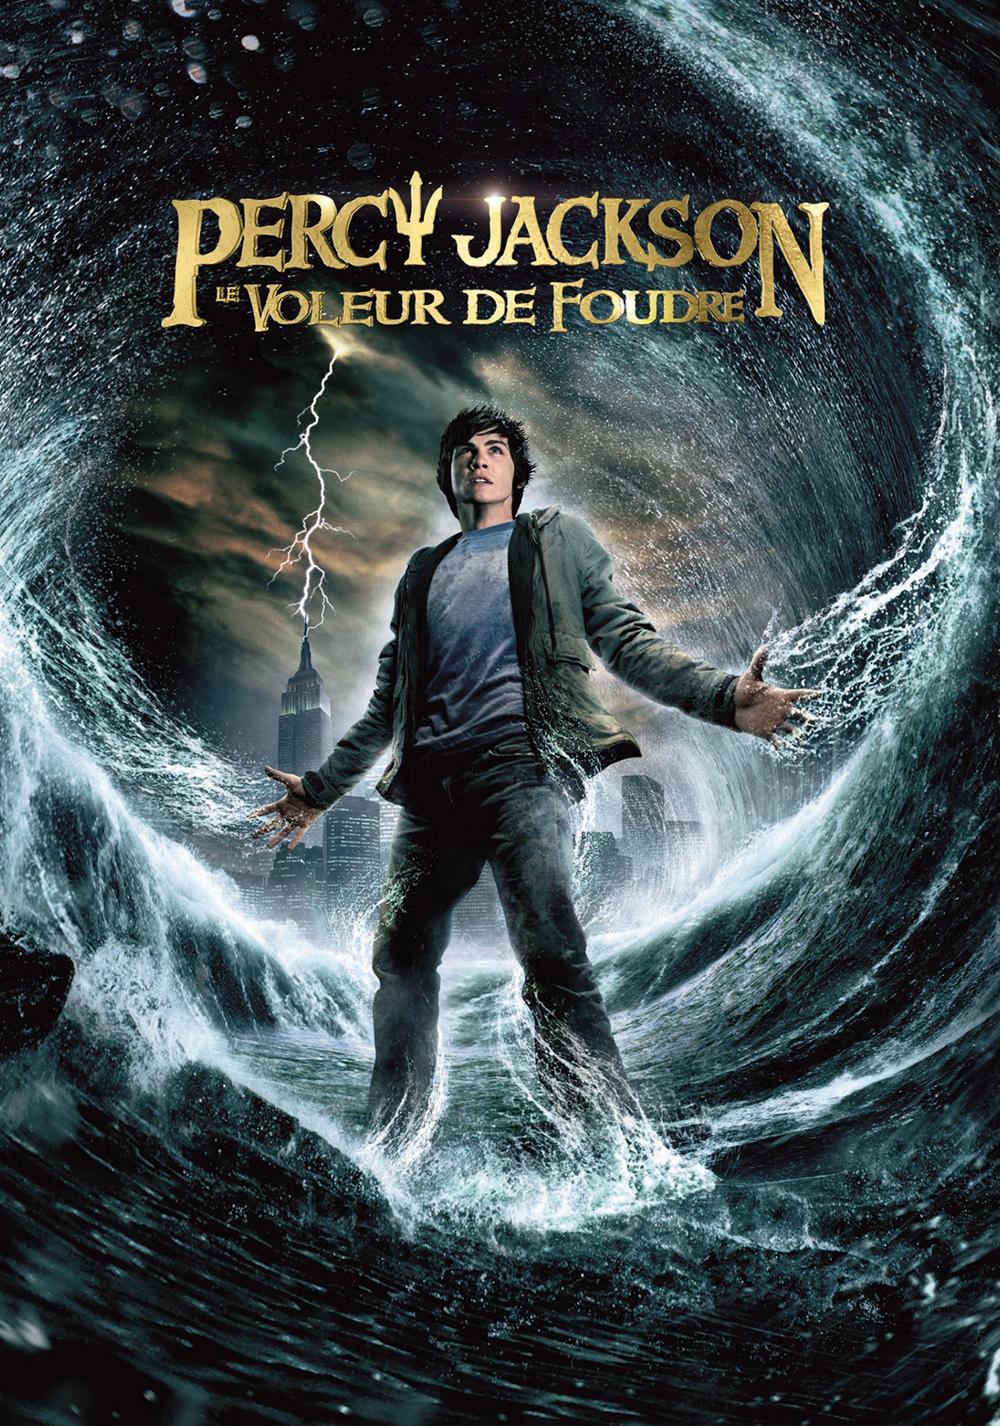 percy jackson & the olympians pdf